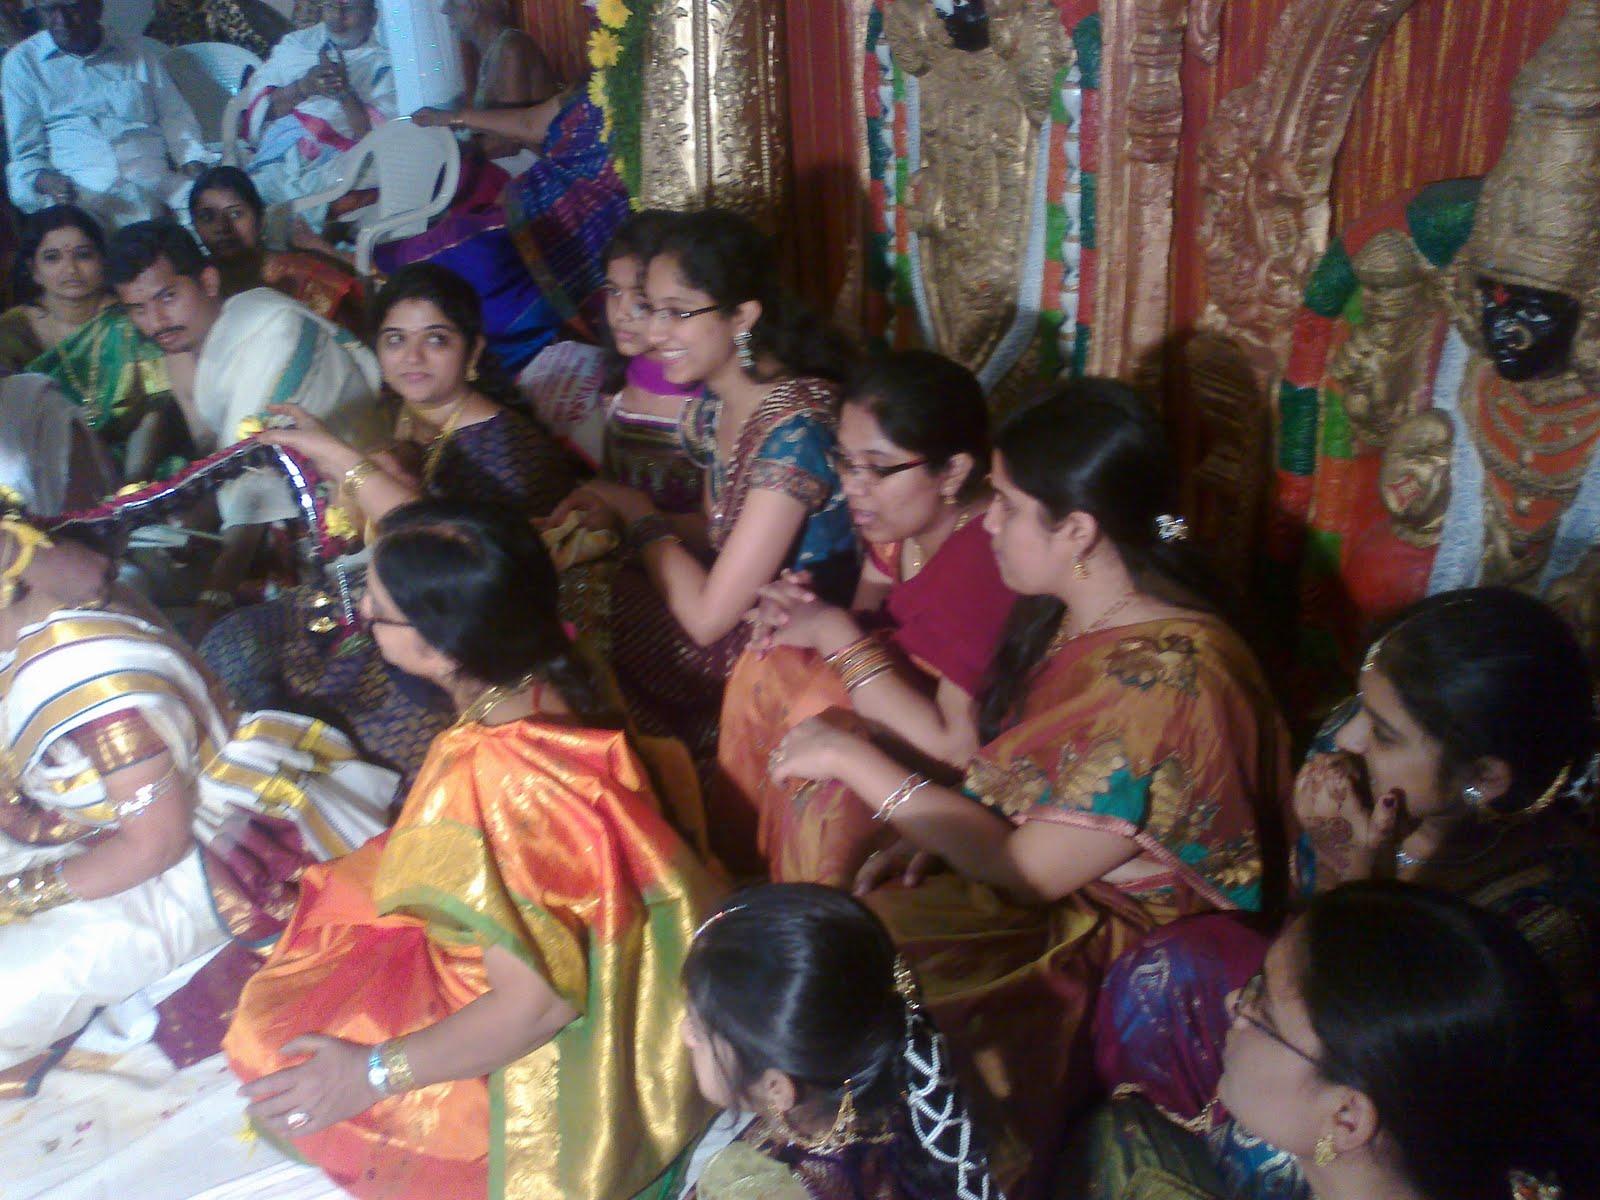 Maa menalludu kurmeti krishna kanth with harinibala vivaham @ swetha